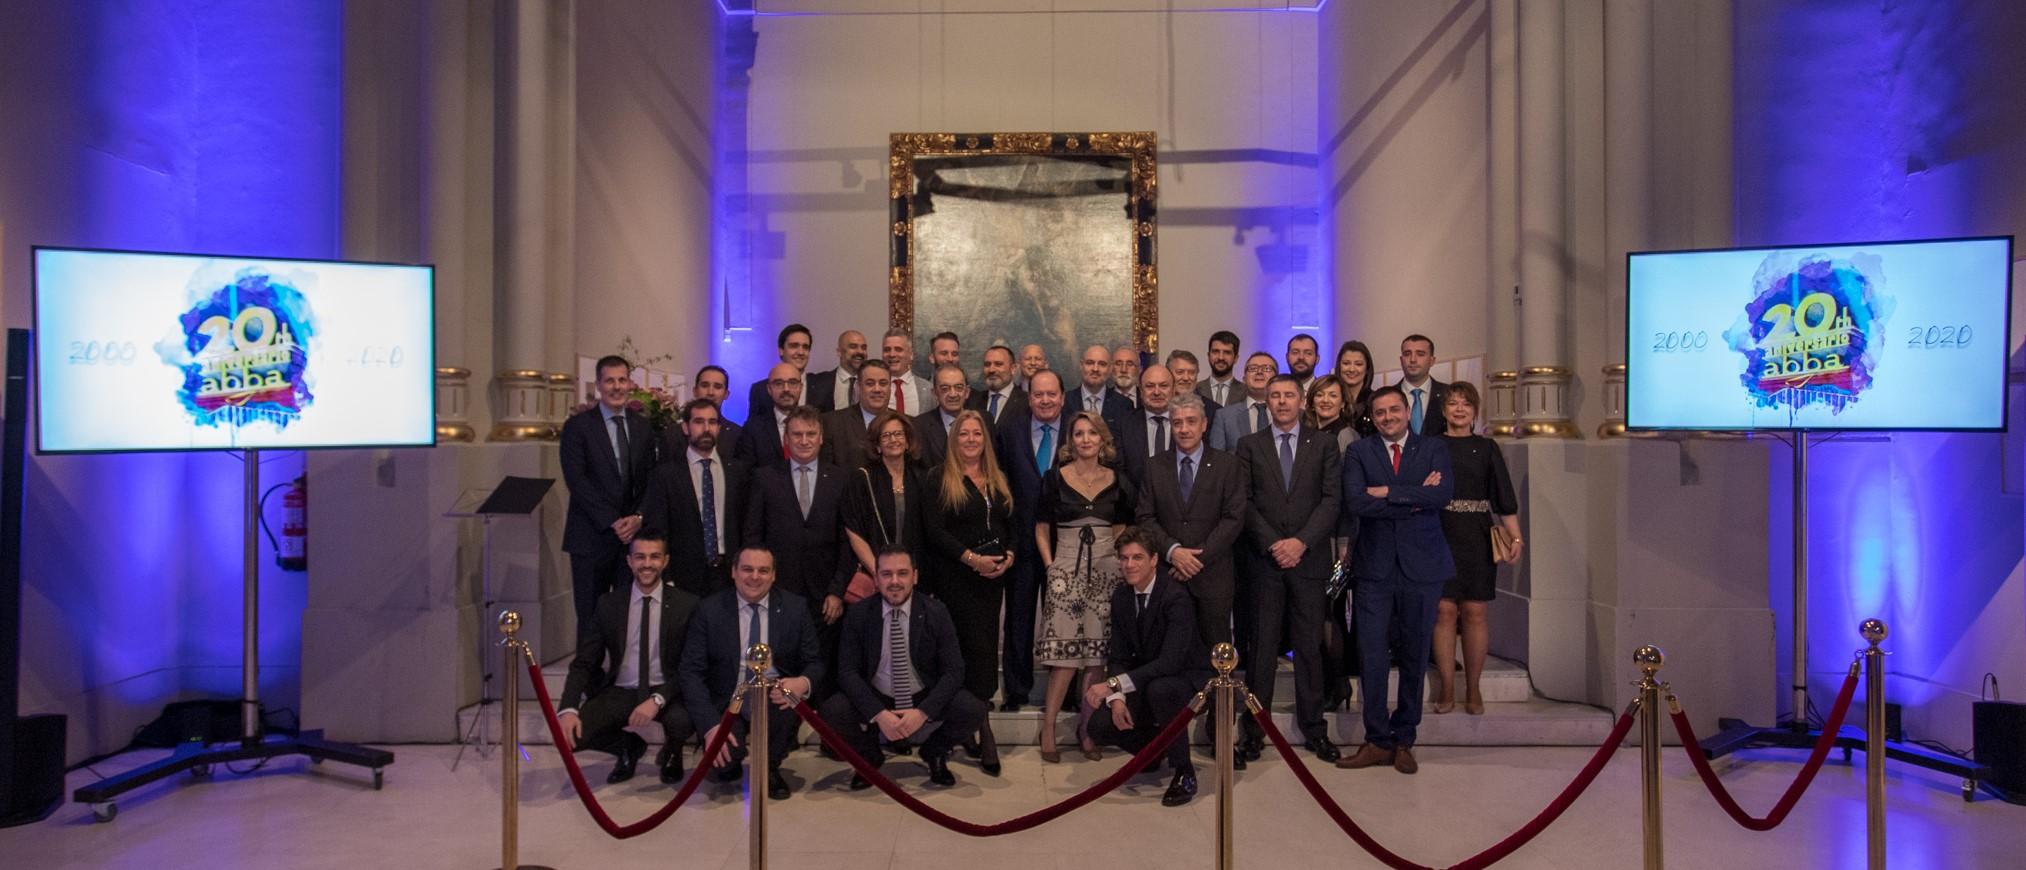 Abba Hoteles celebra su 20º Aniversario en plena expansión